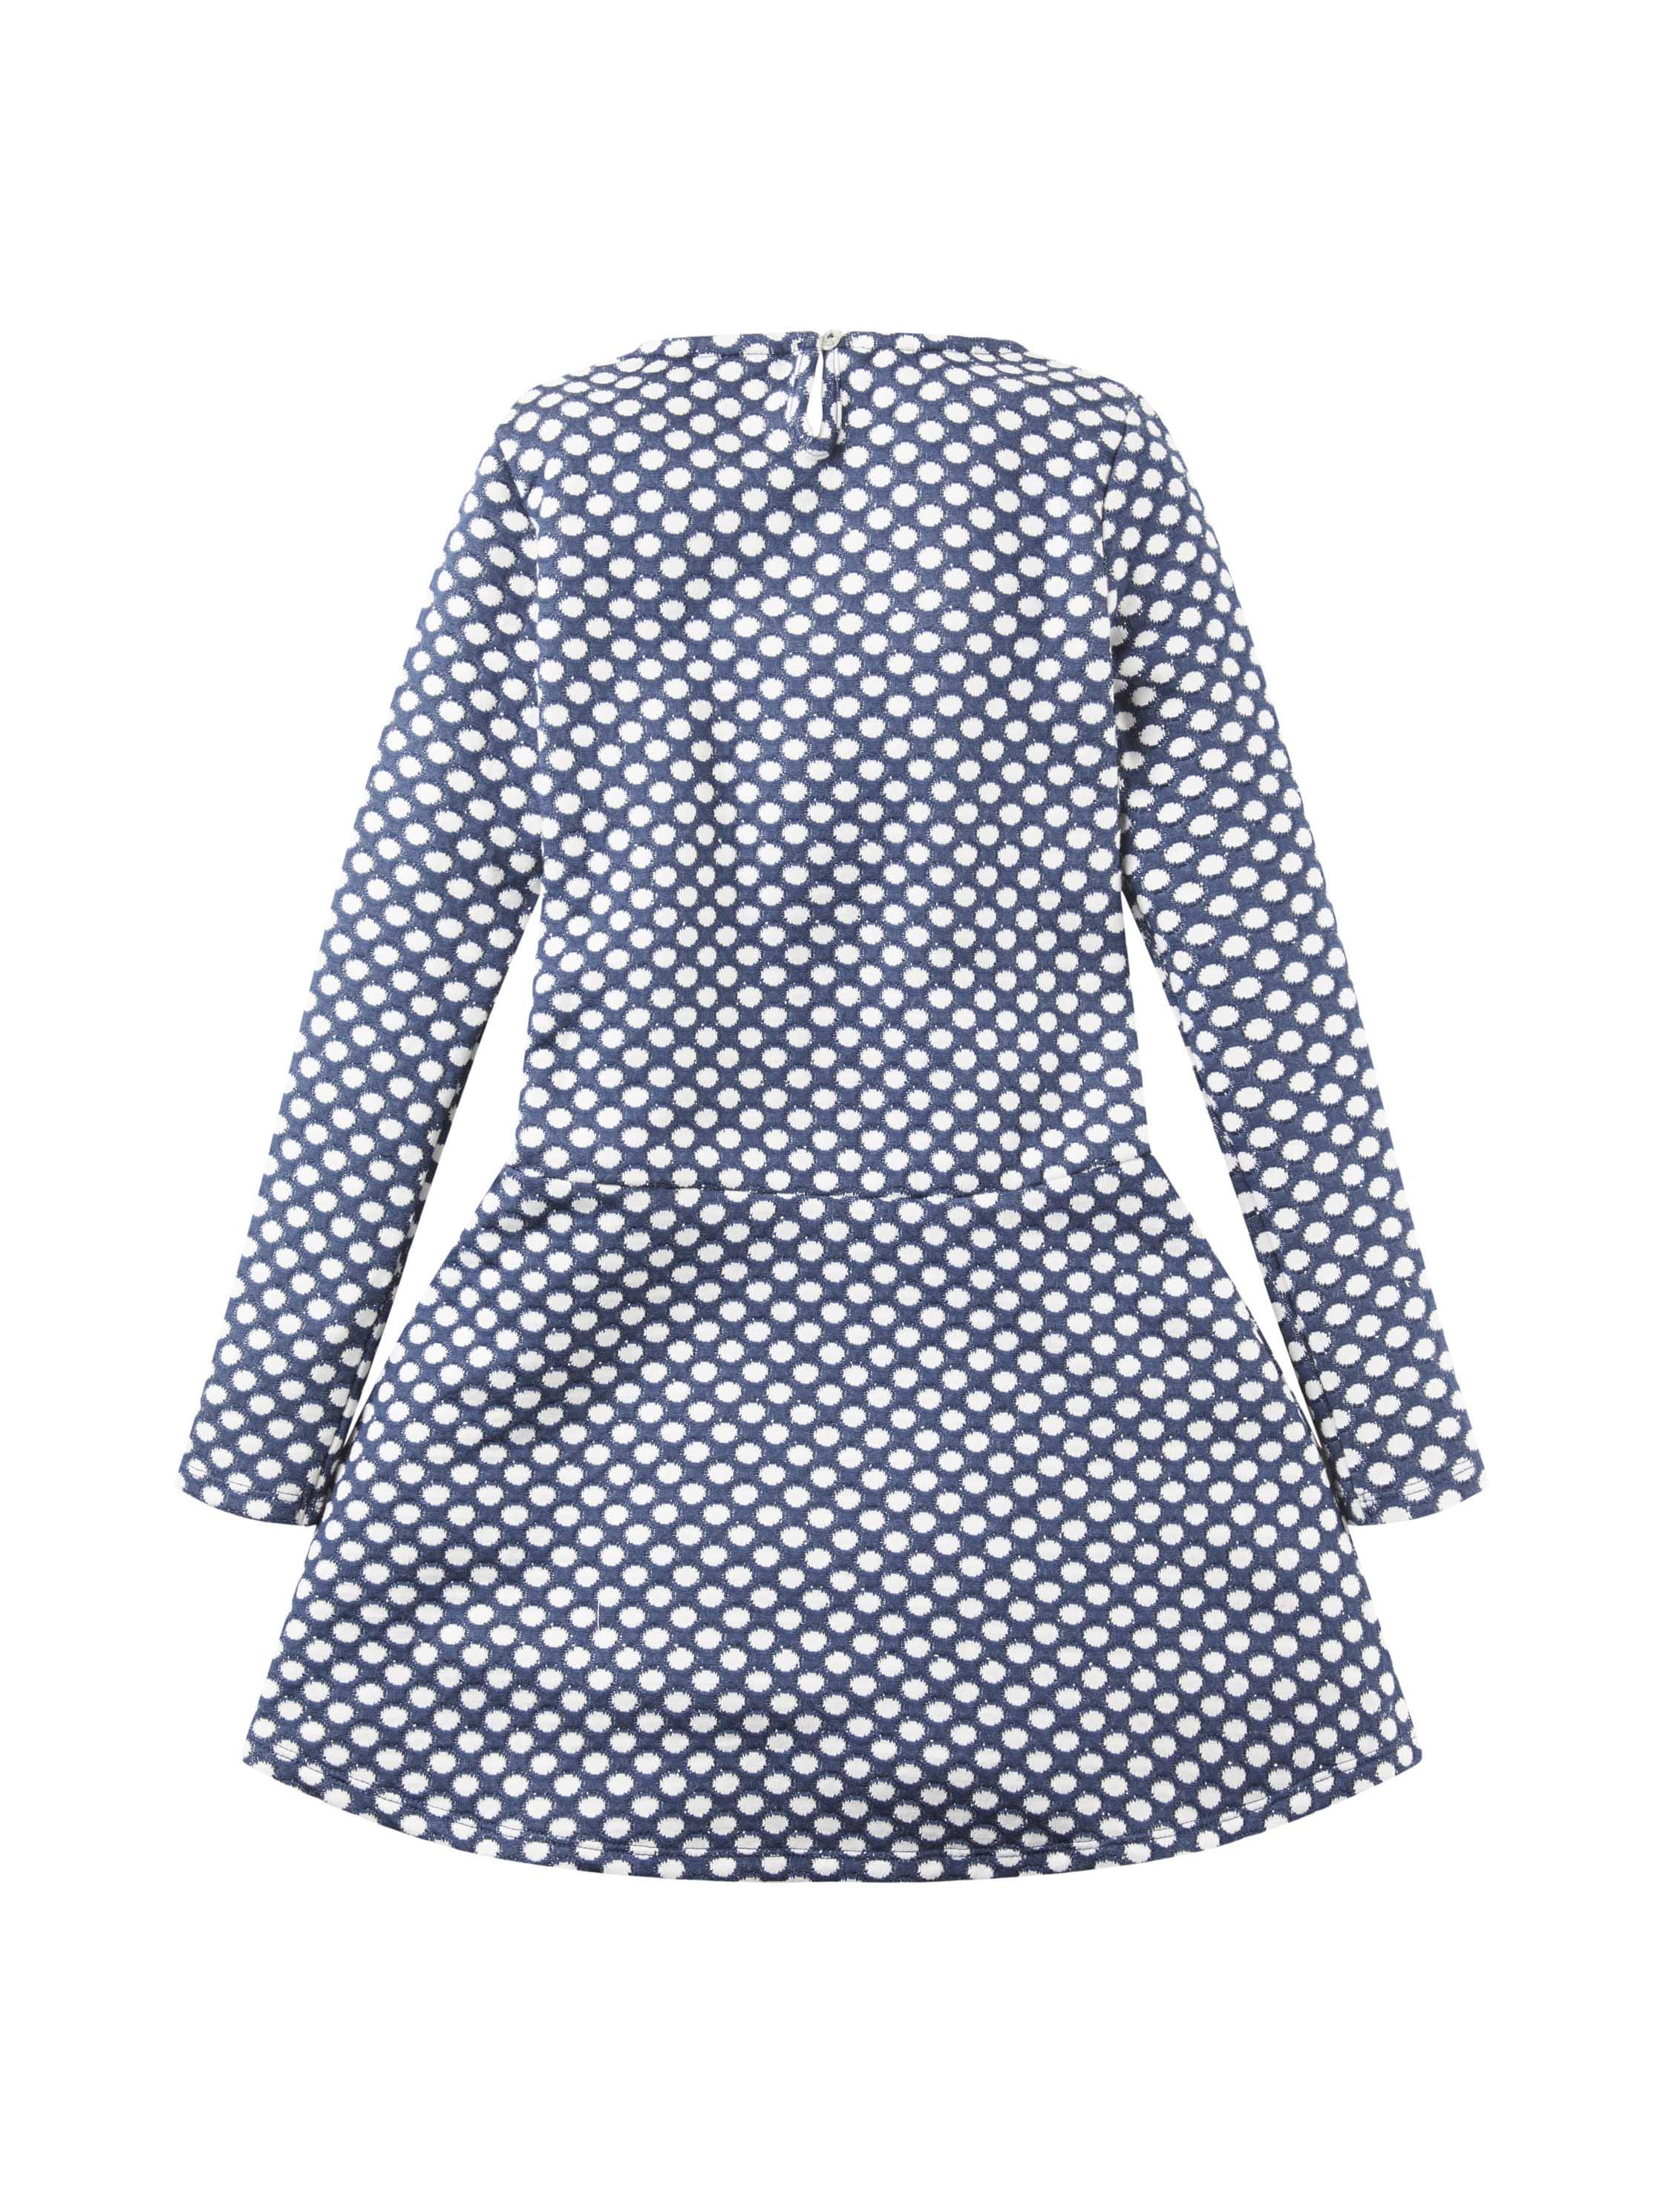 dress patterned, dress blues-blue